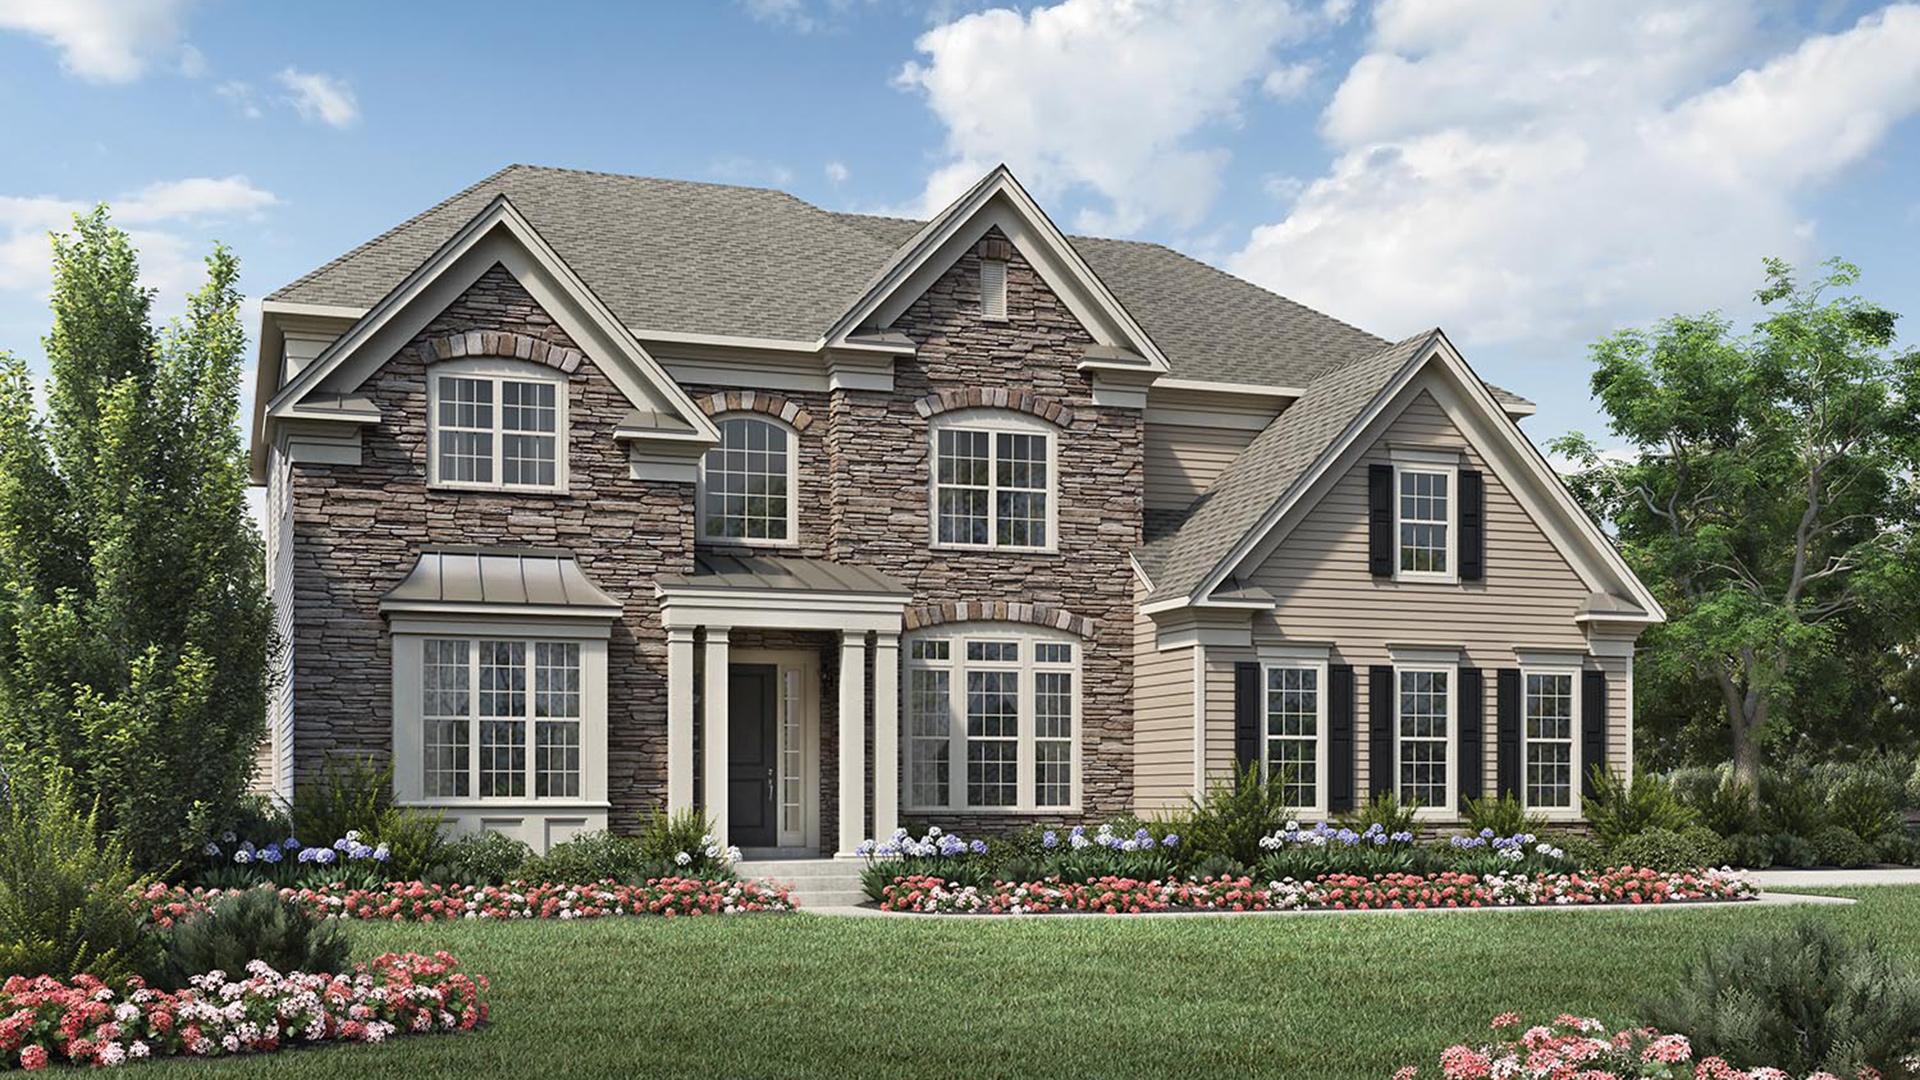 Enclave At White Oak Creek The Stallworth Home Design